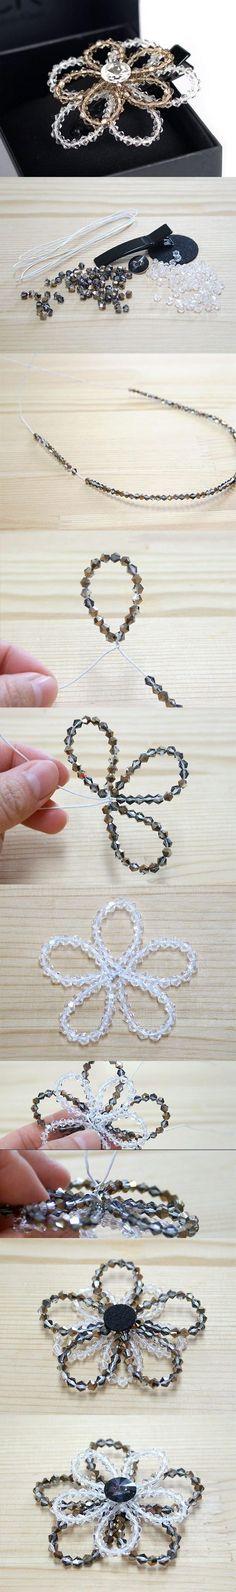 DIY Beaded Crystal Flower DIY Projects